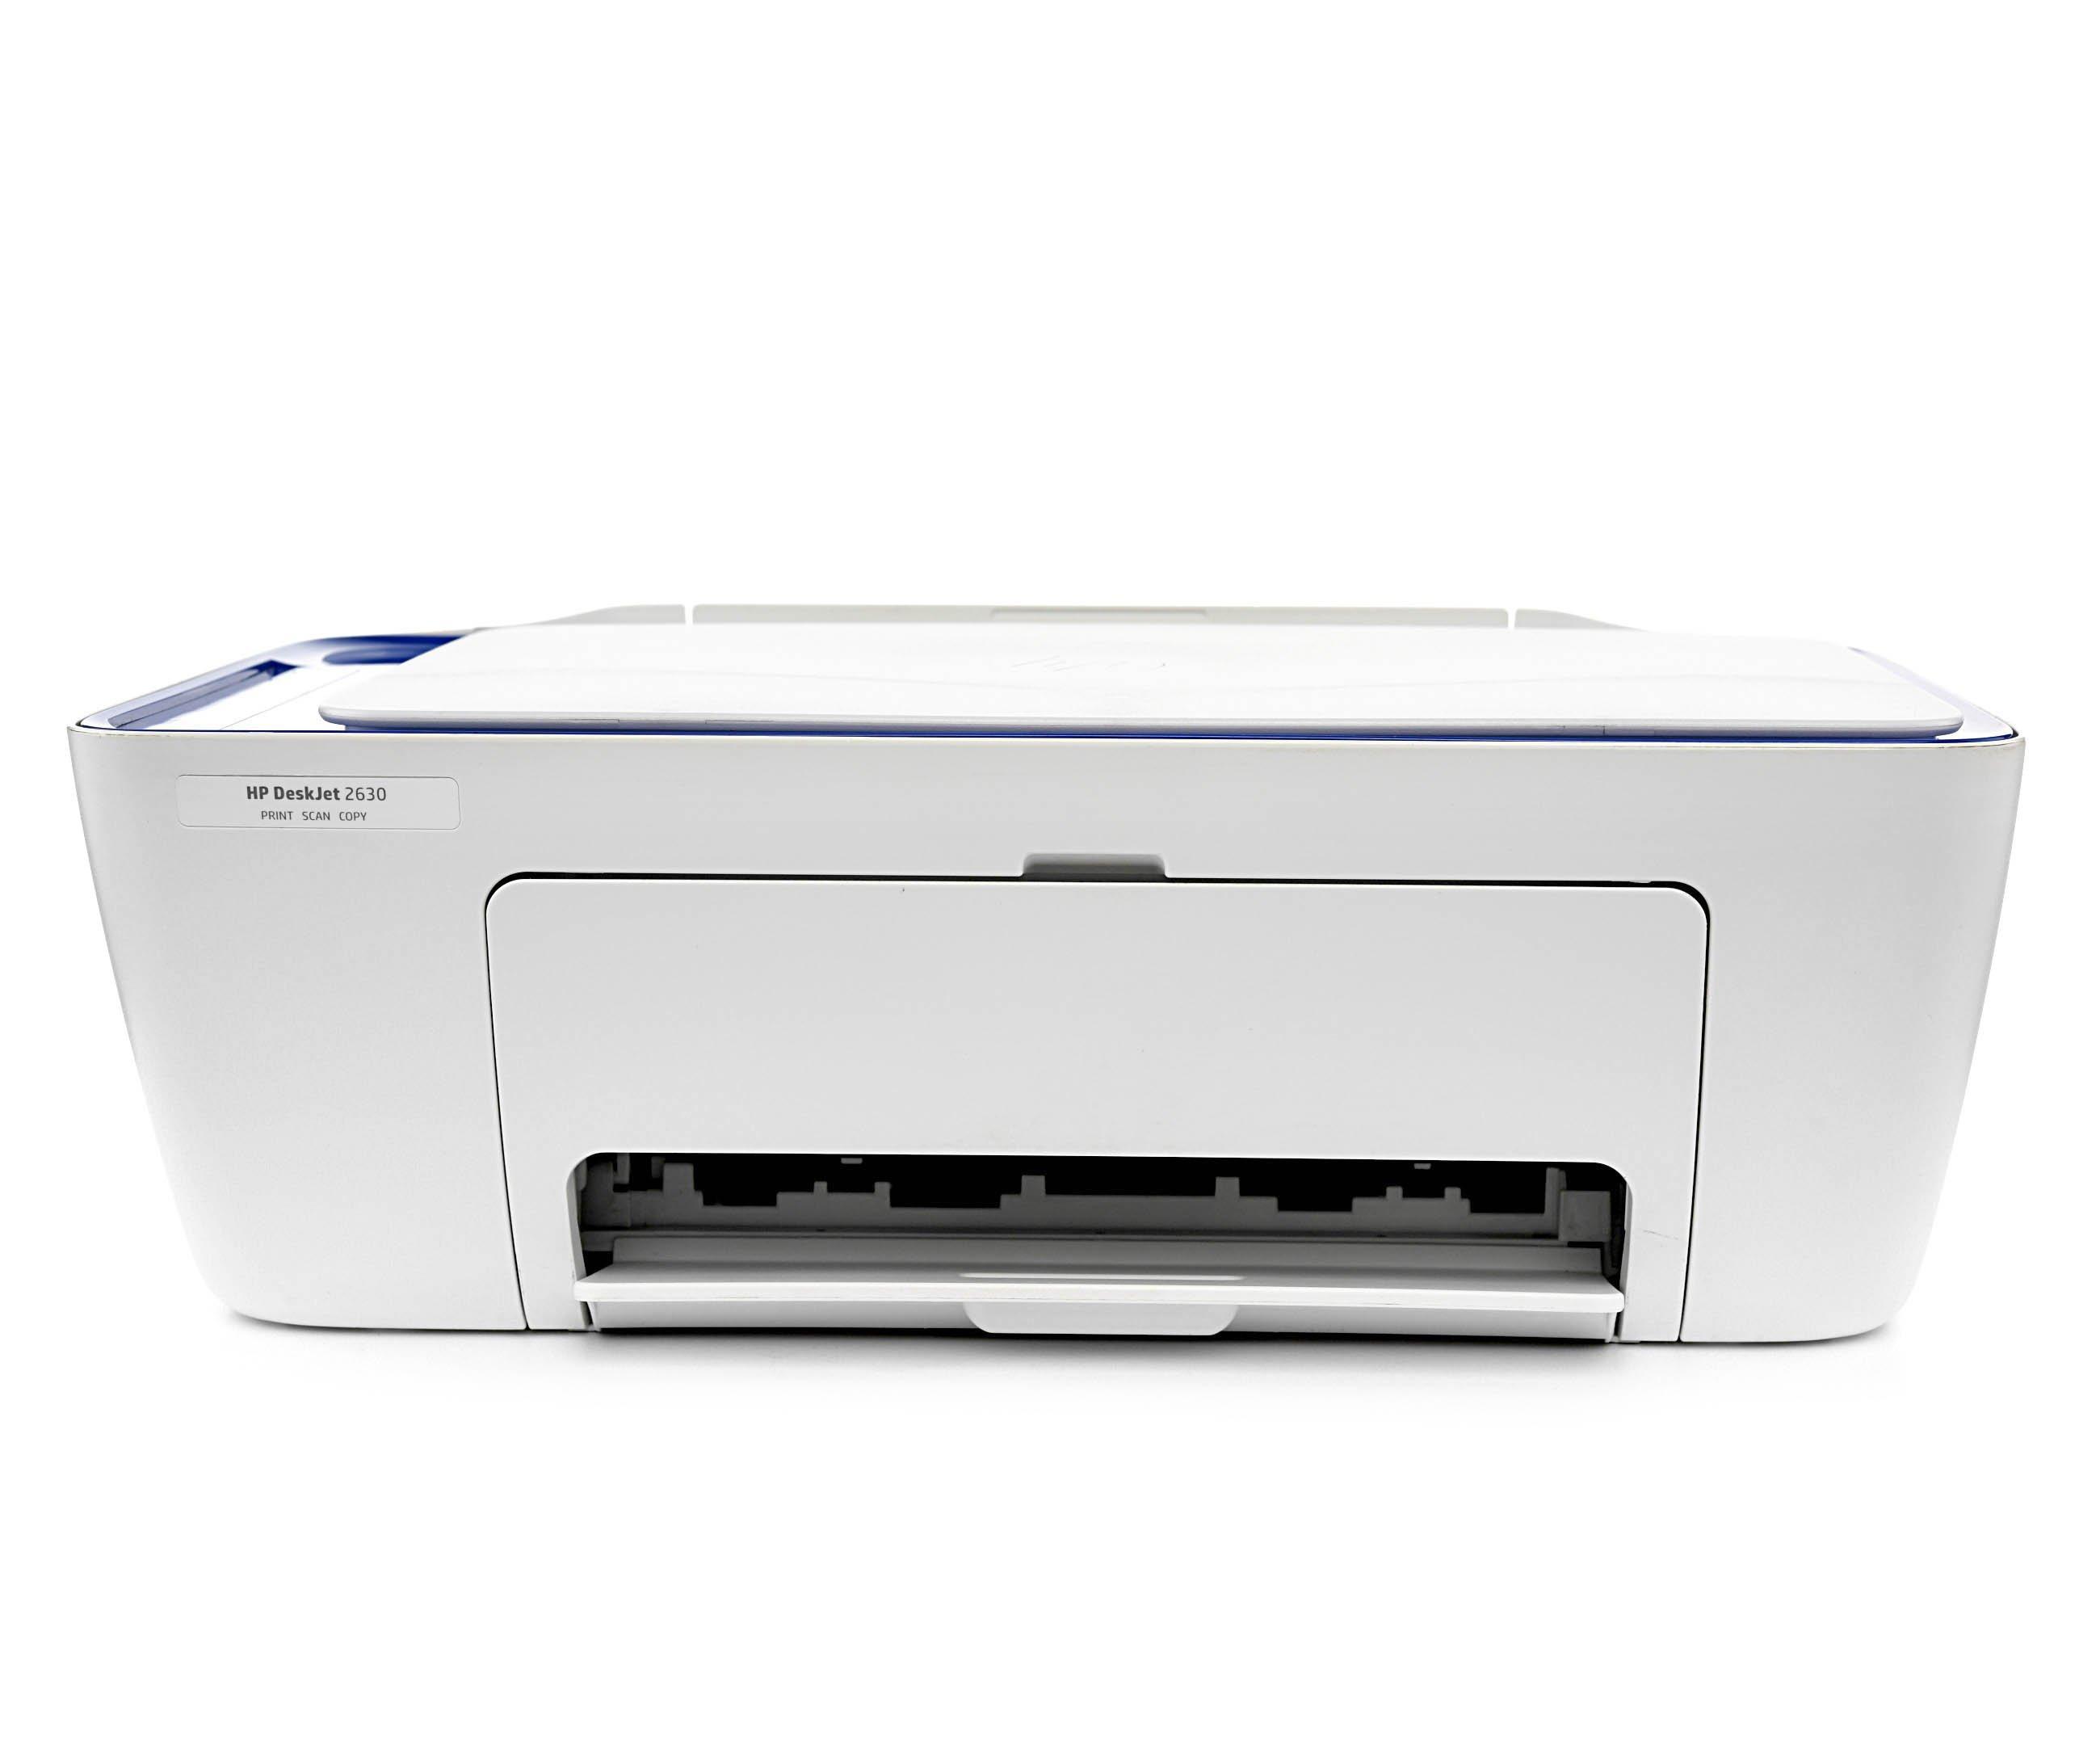 HP DeskJet 2630 All-in-One Prnter - Print, copy, scan ...